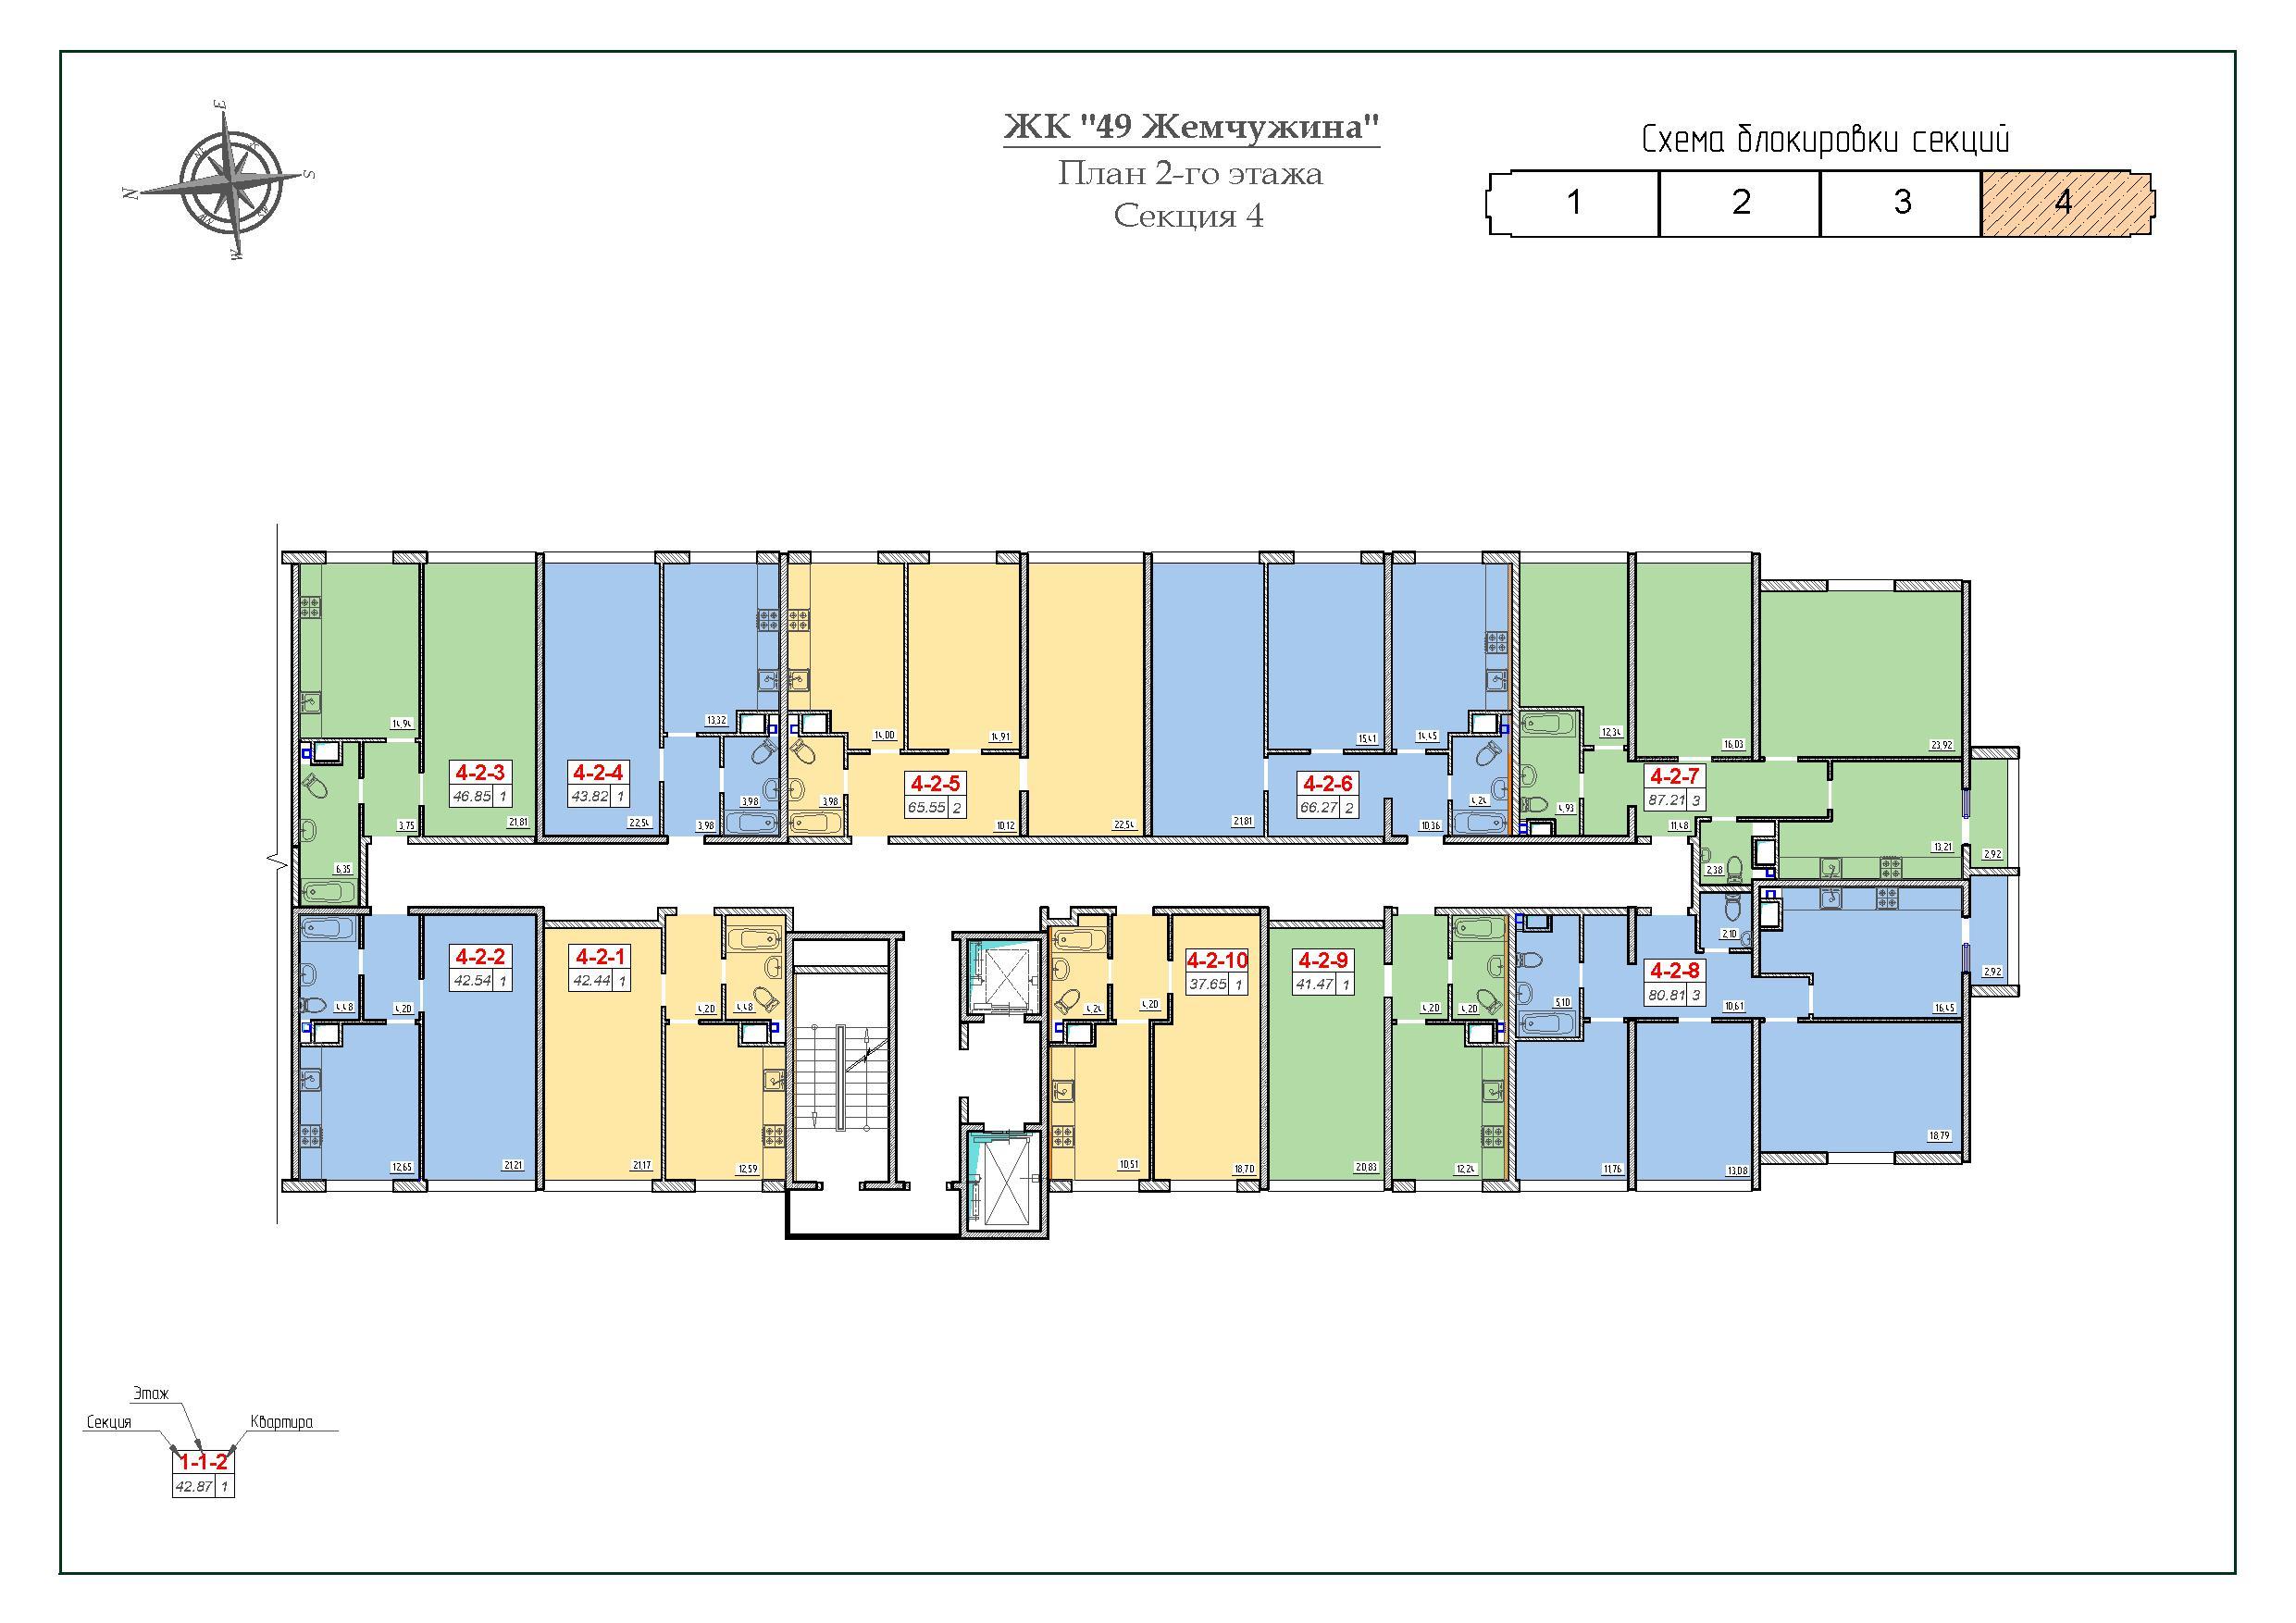 ЖК 49 Жемчужина 4 секция план этажа